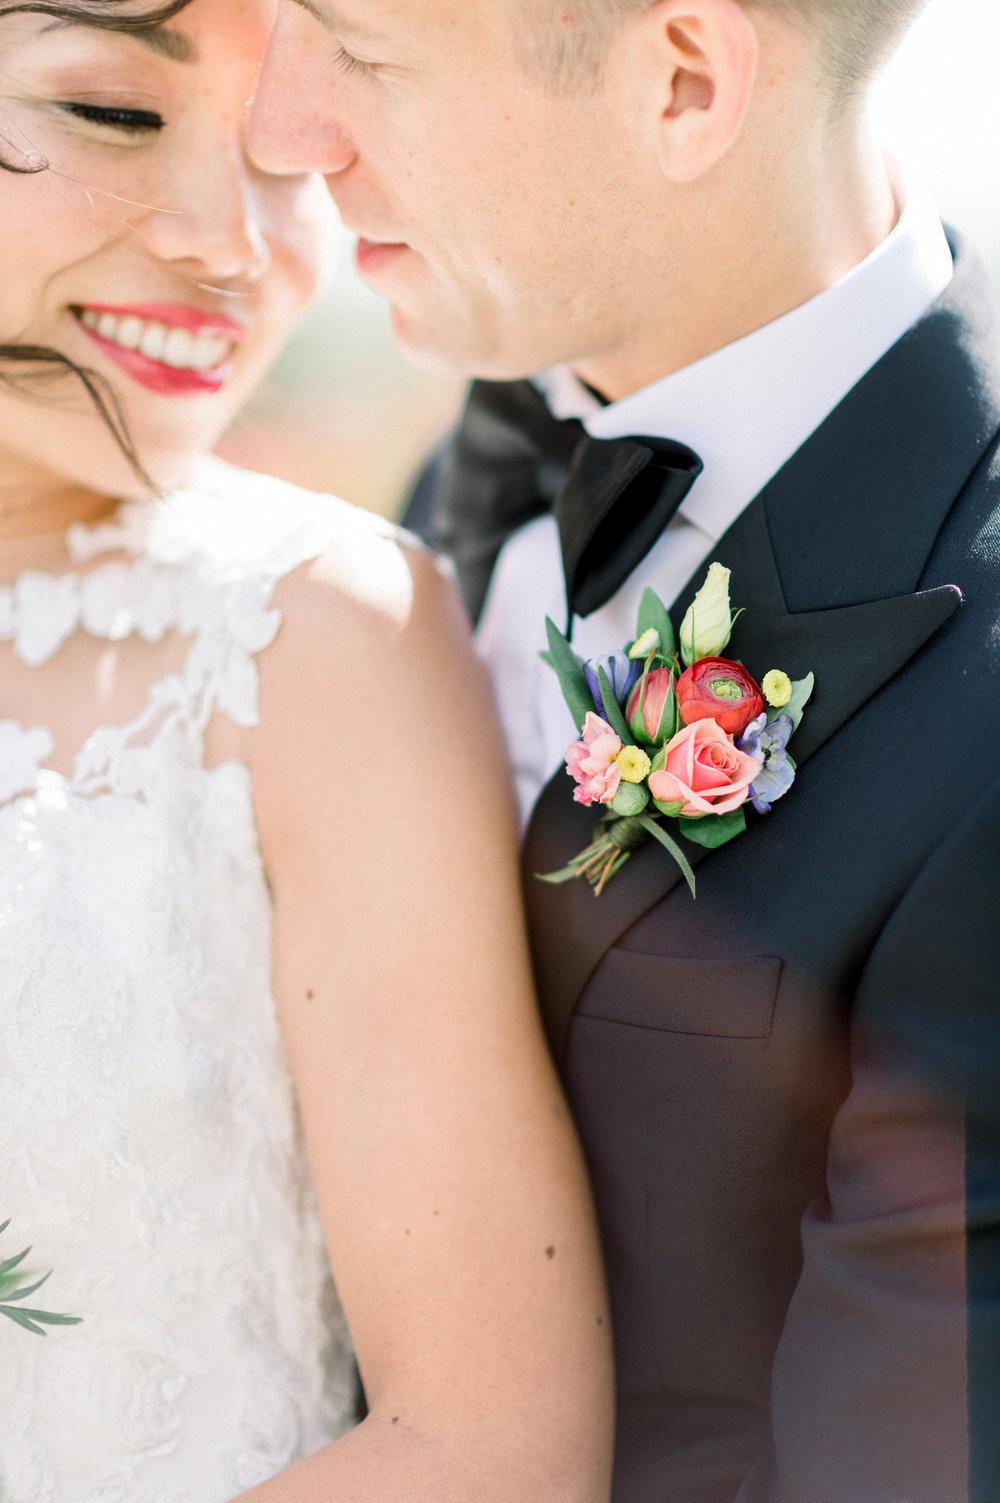 Mamiko-Aaron-Wedding-Whitney-Heard-Photography-6007.jpg